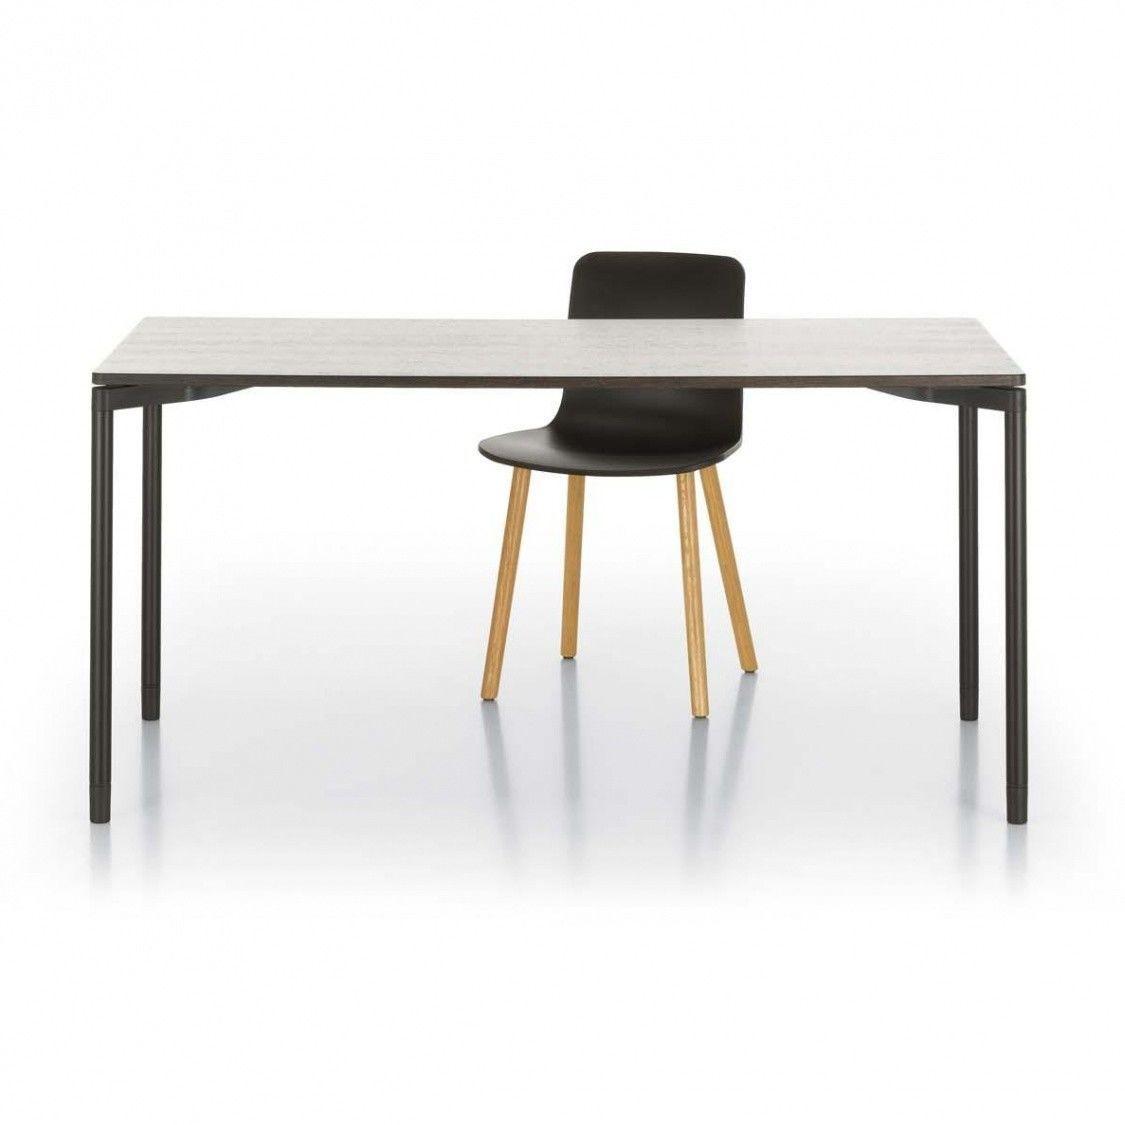 map table schreibtisch vitra. Black Bedroom Furniture Sets. Home Design Ideas